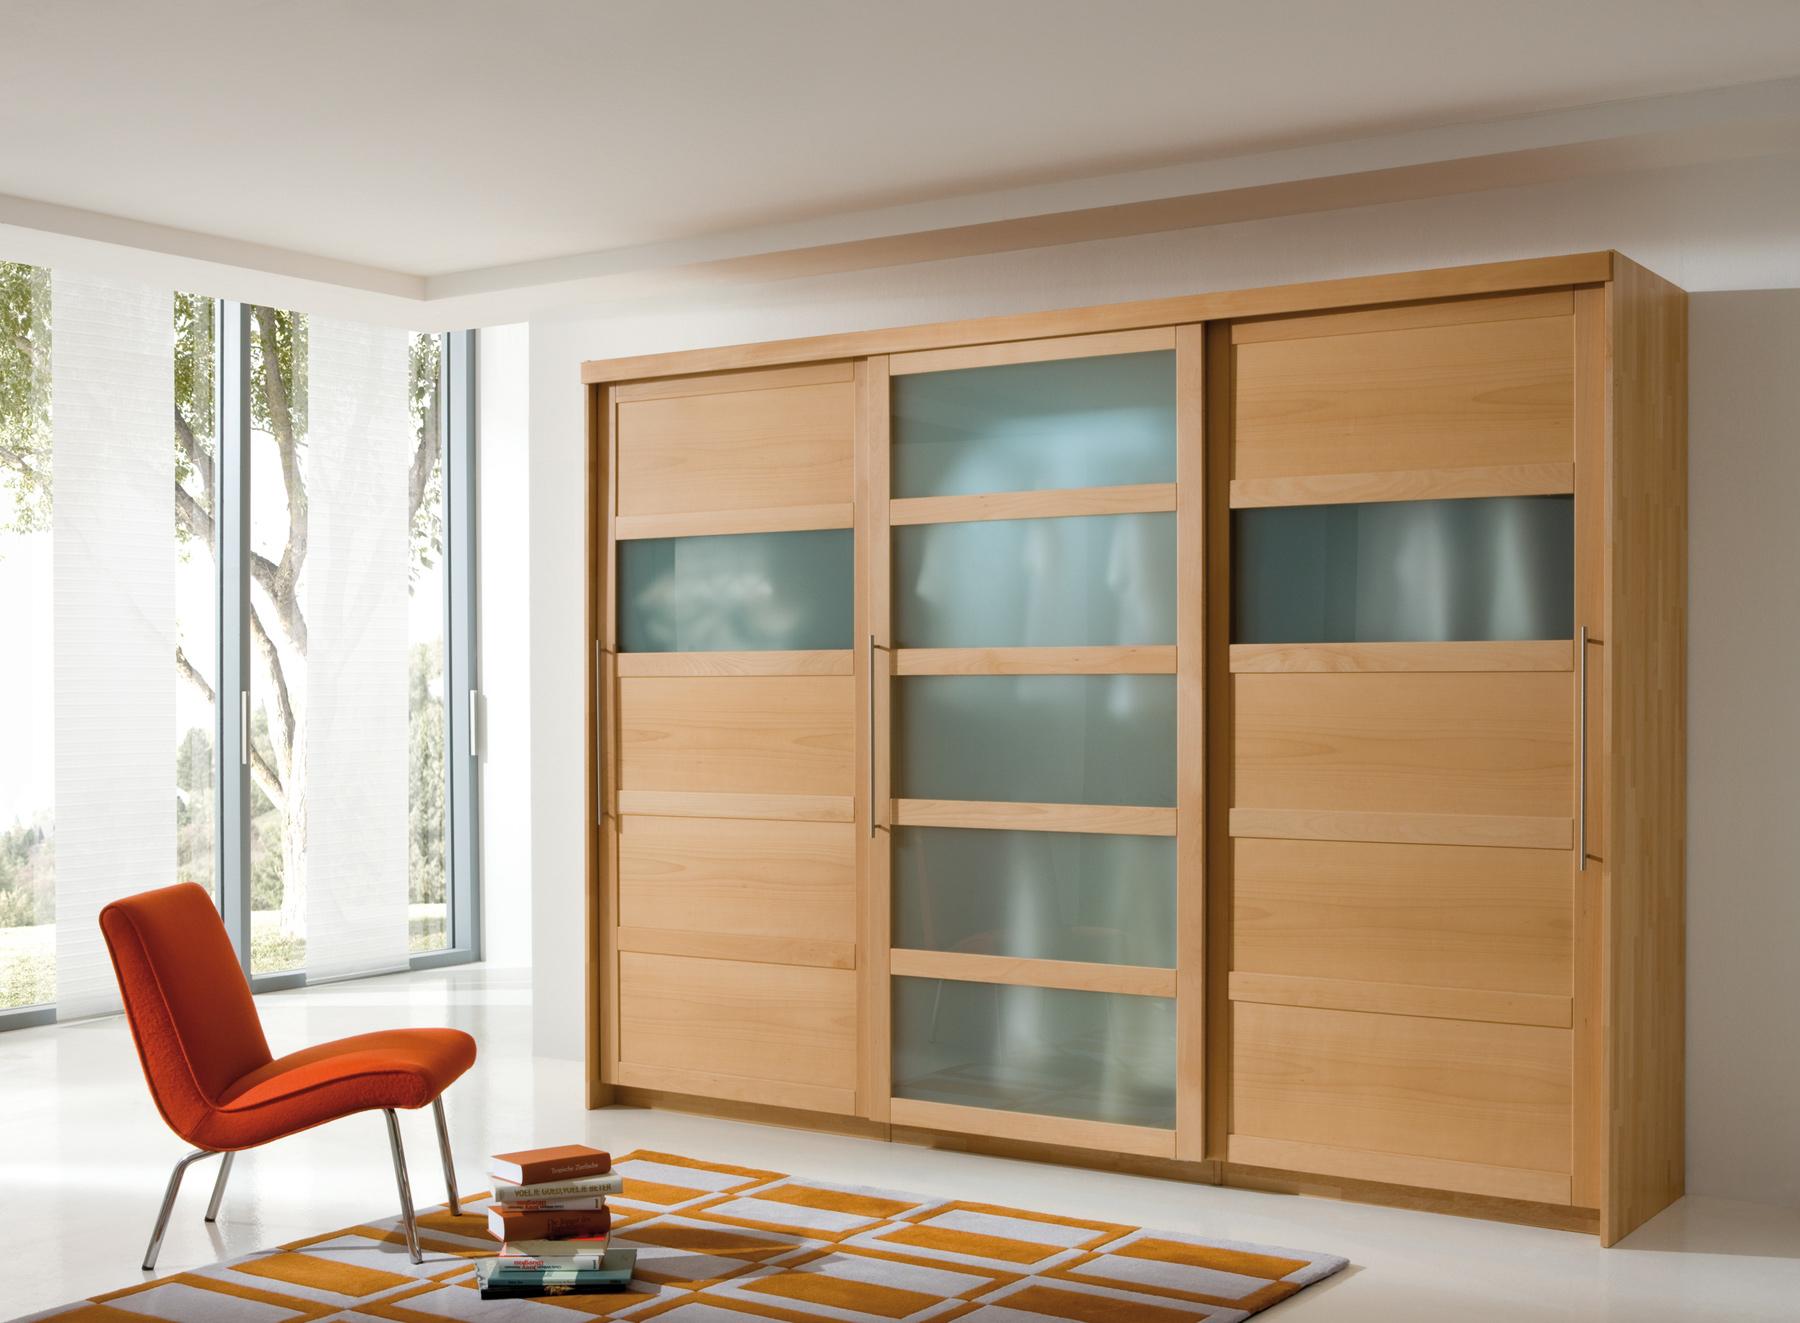 schwebeturenschrank geringe tiefe. Black Bedroom Furniture Sets. Home Design Ideas